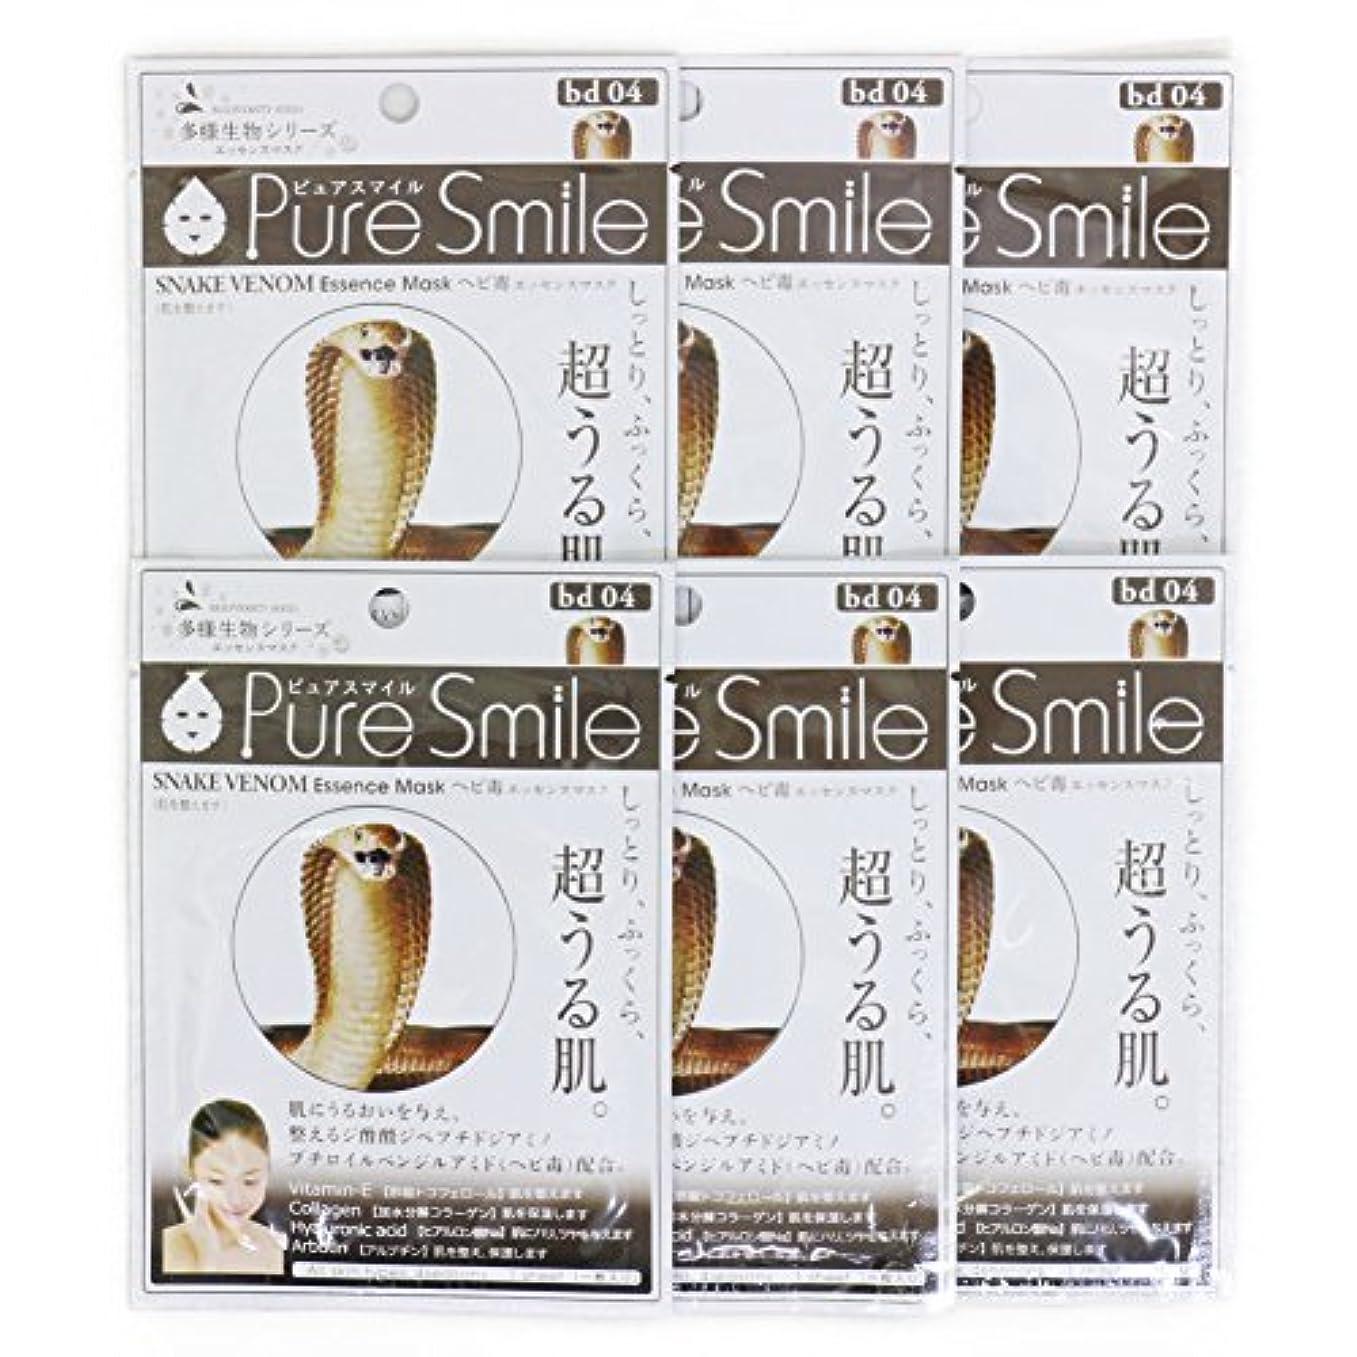 Pure Smile ピュアスマイル 多様生物エッセンスマスク ヘビ毒 6枚セット